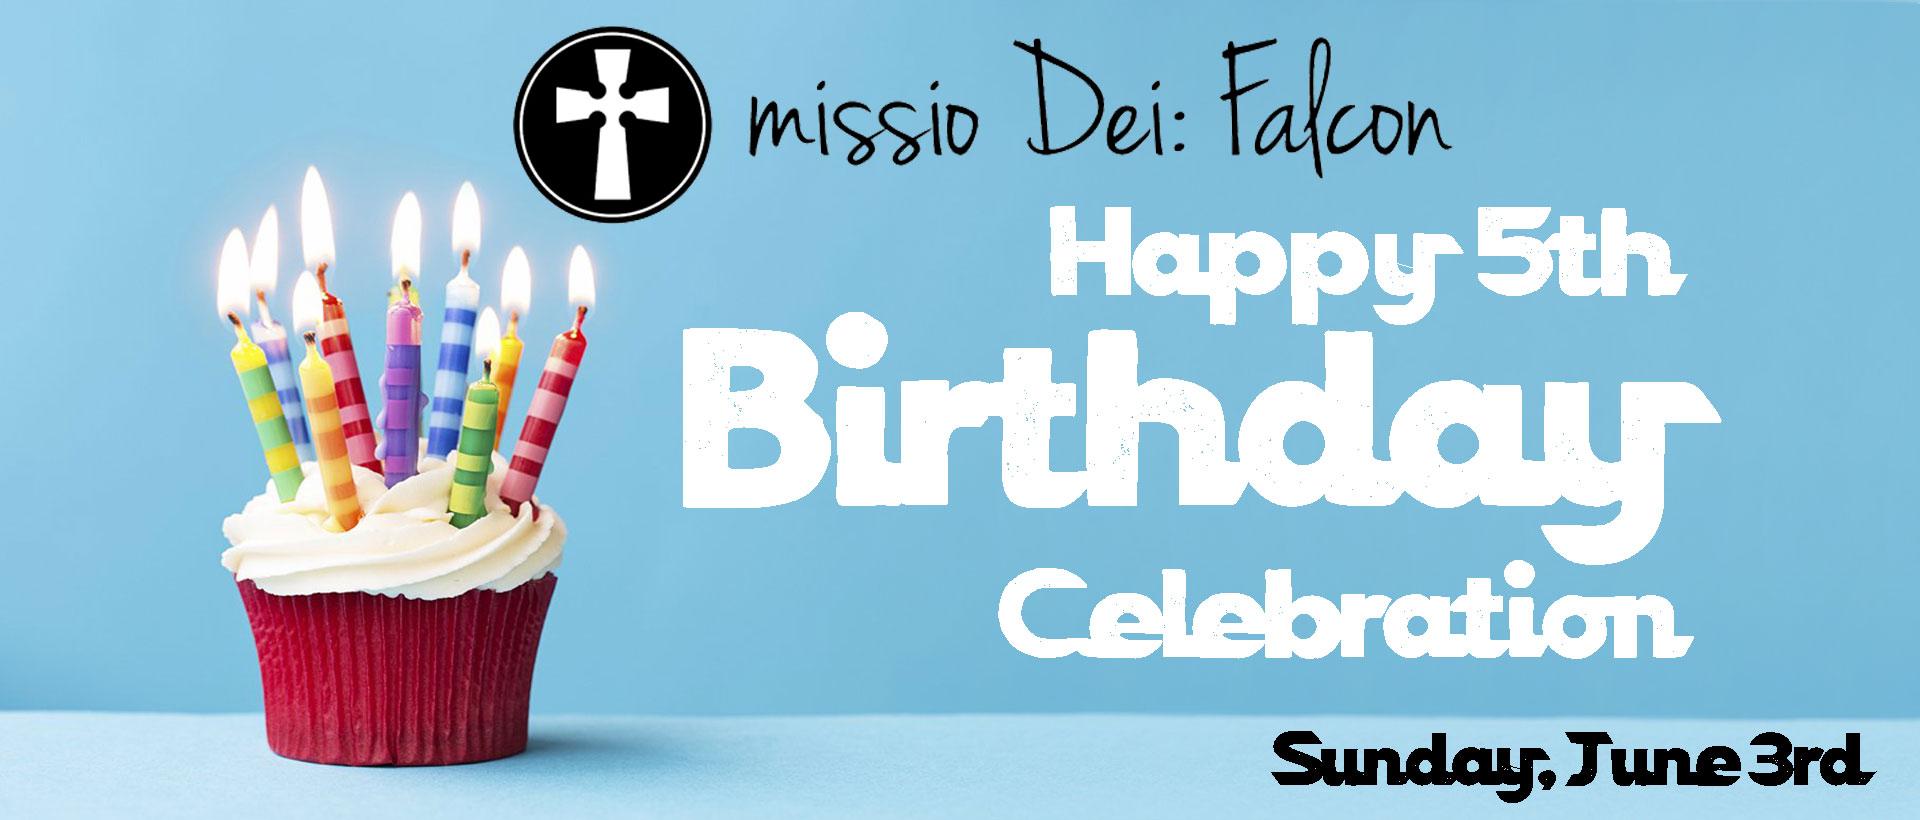 missio Dei's 5th Birthday Celebration – June 3rd, 2018